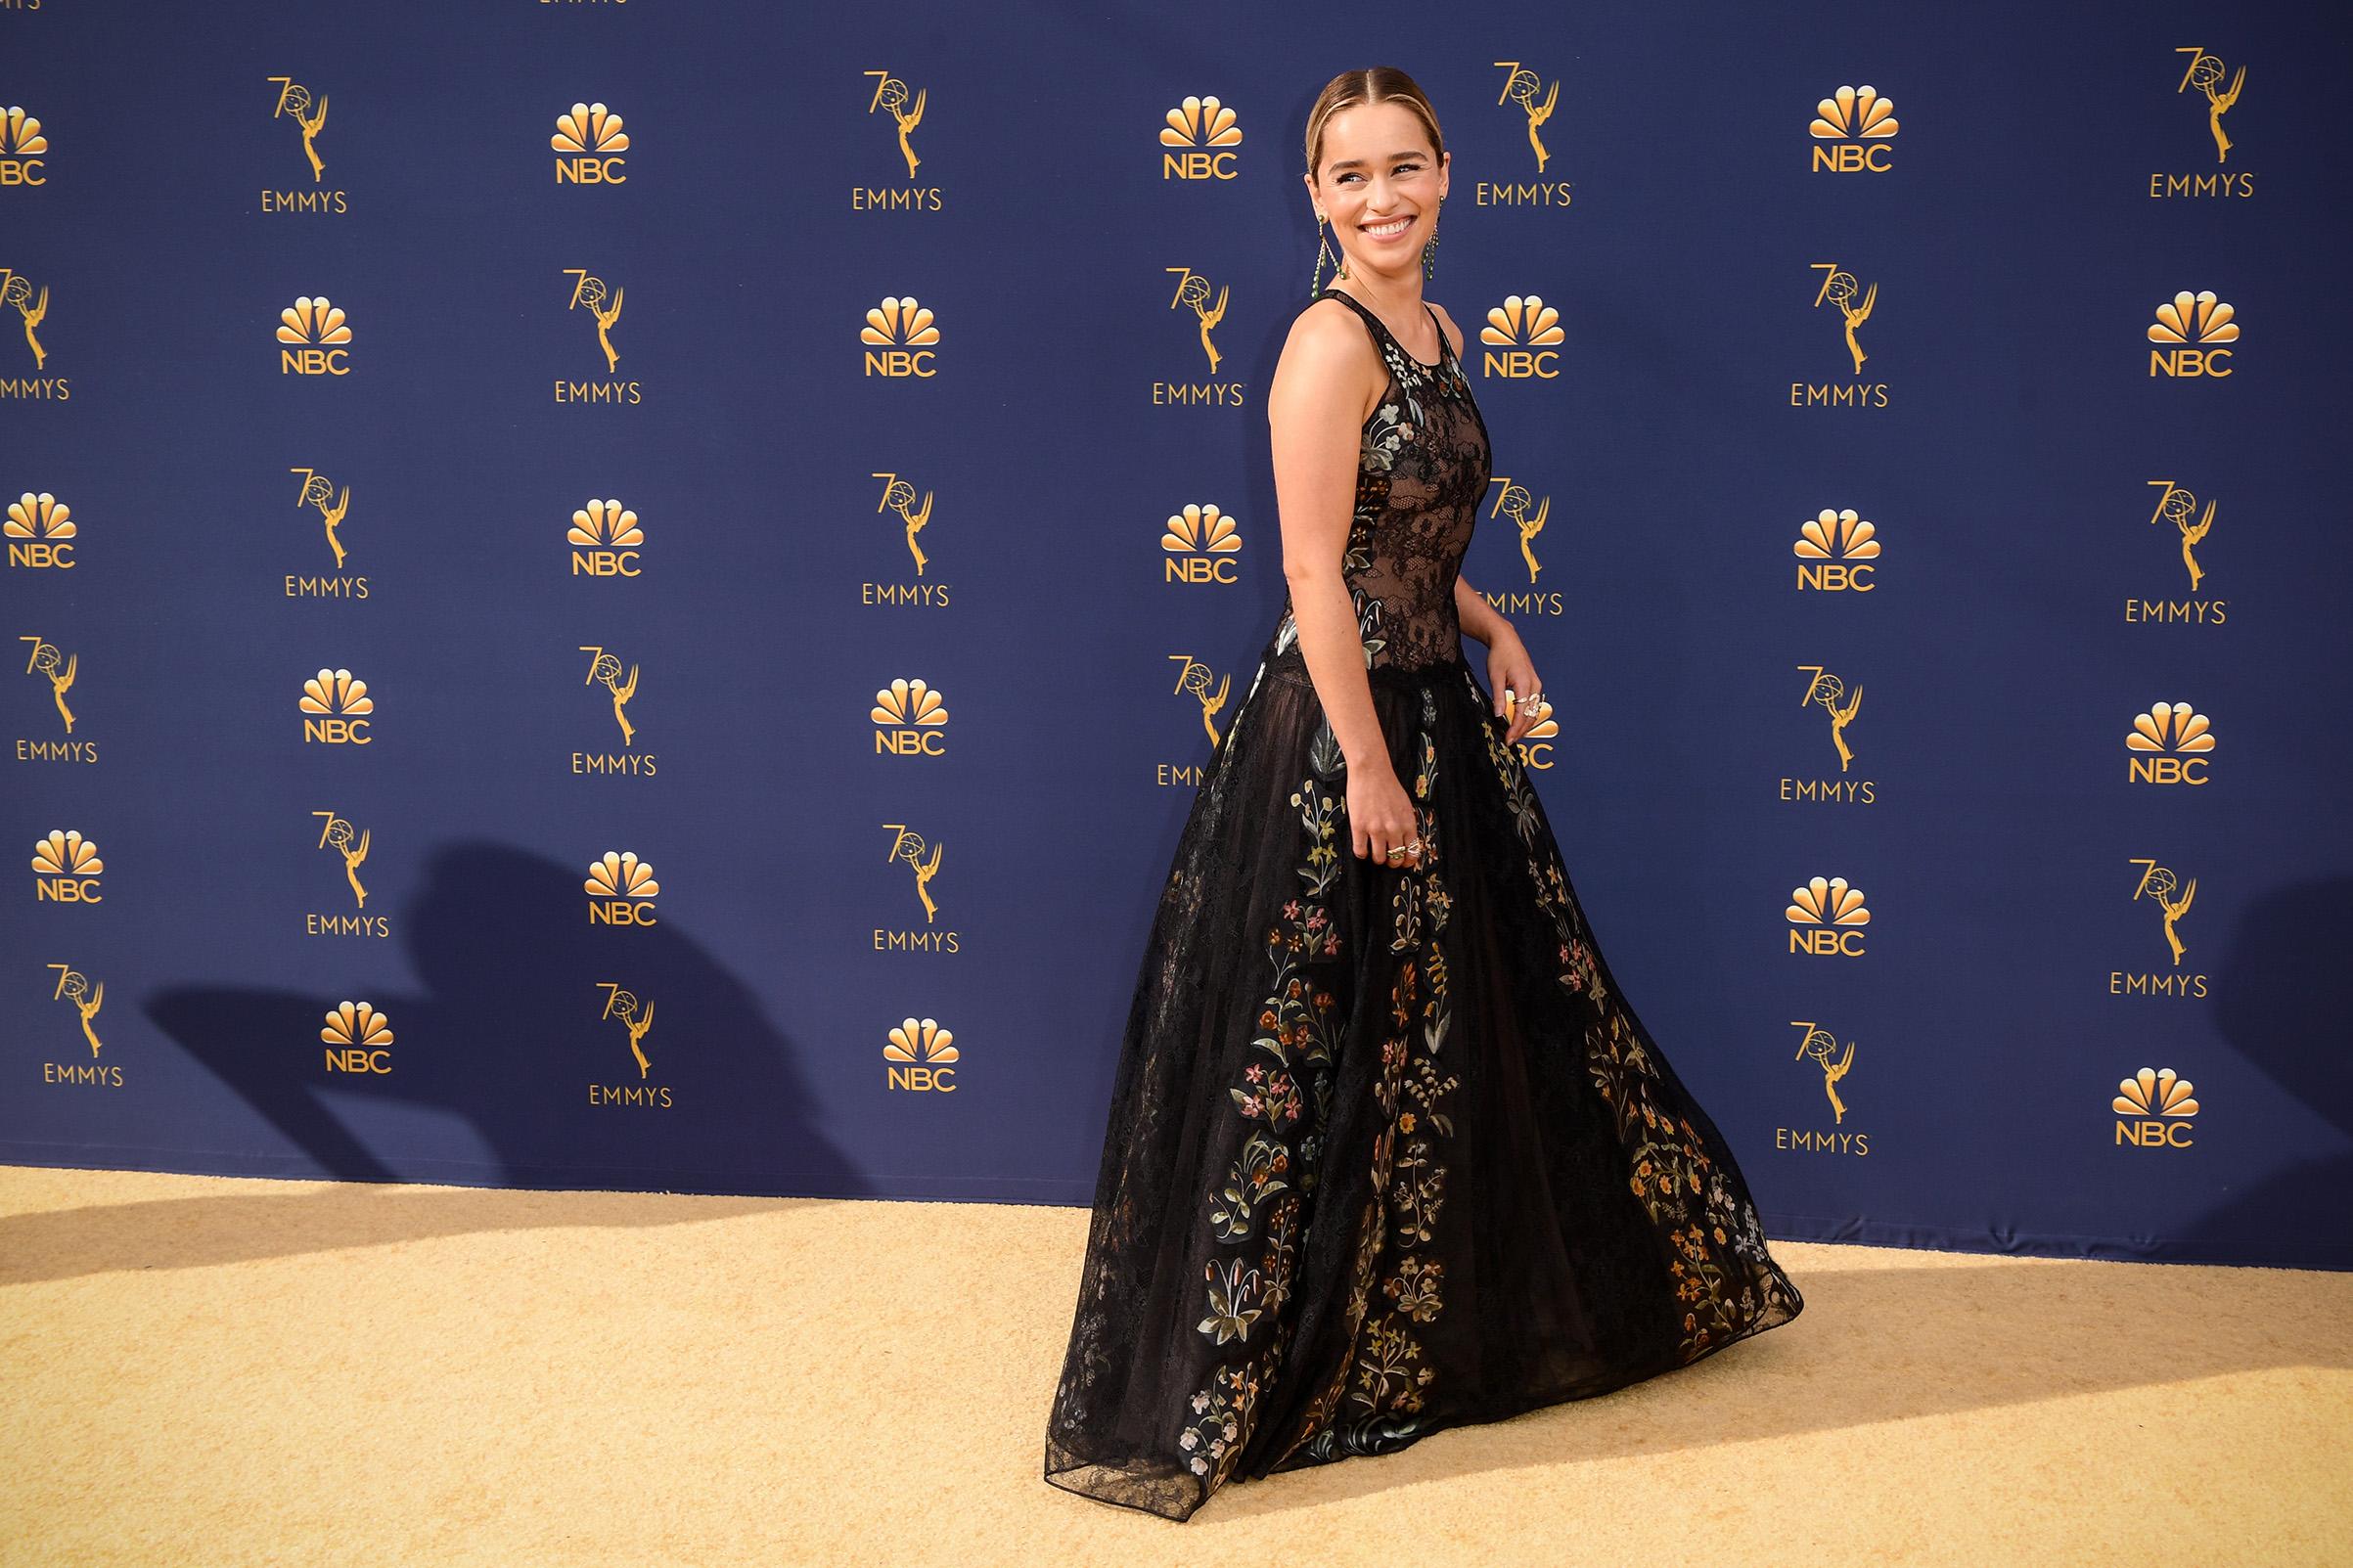 Emilia Clarke at the 70th Primetime Emmy Awards on Sept. 17.